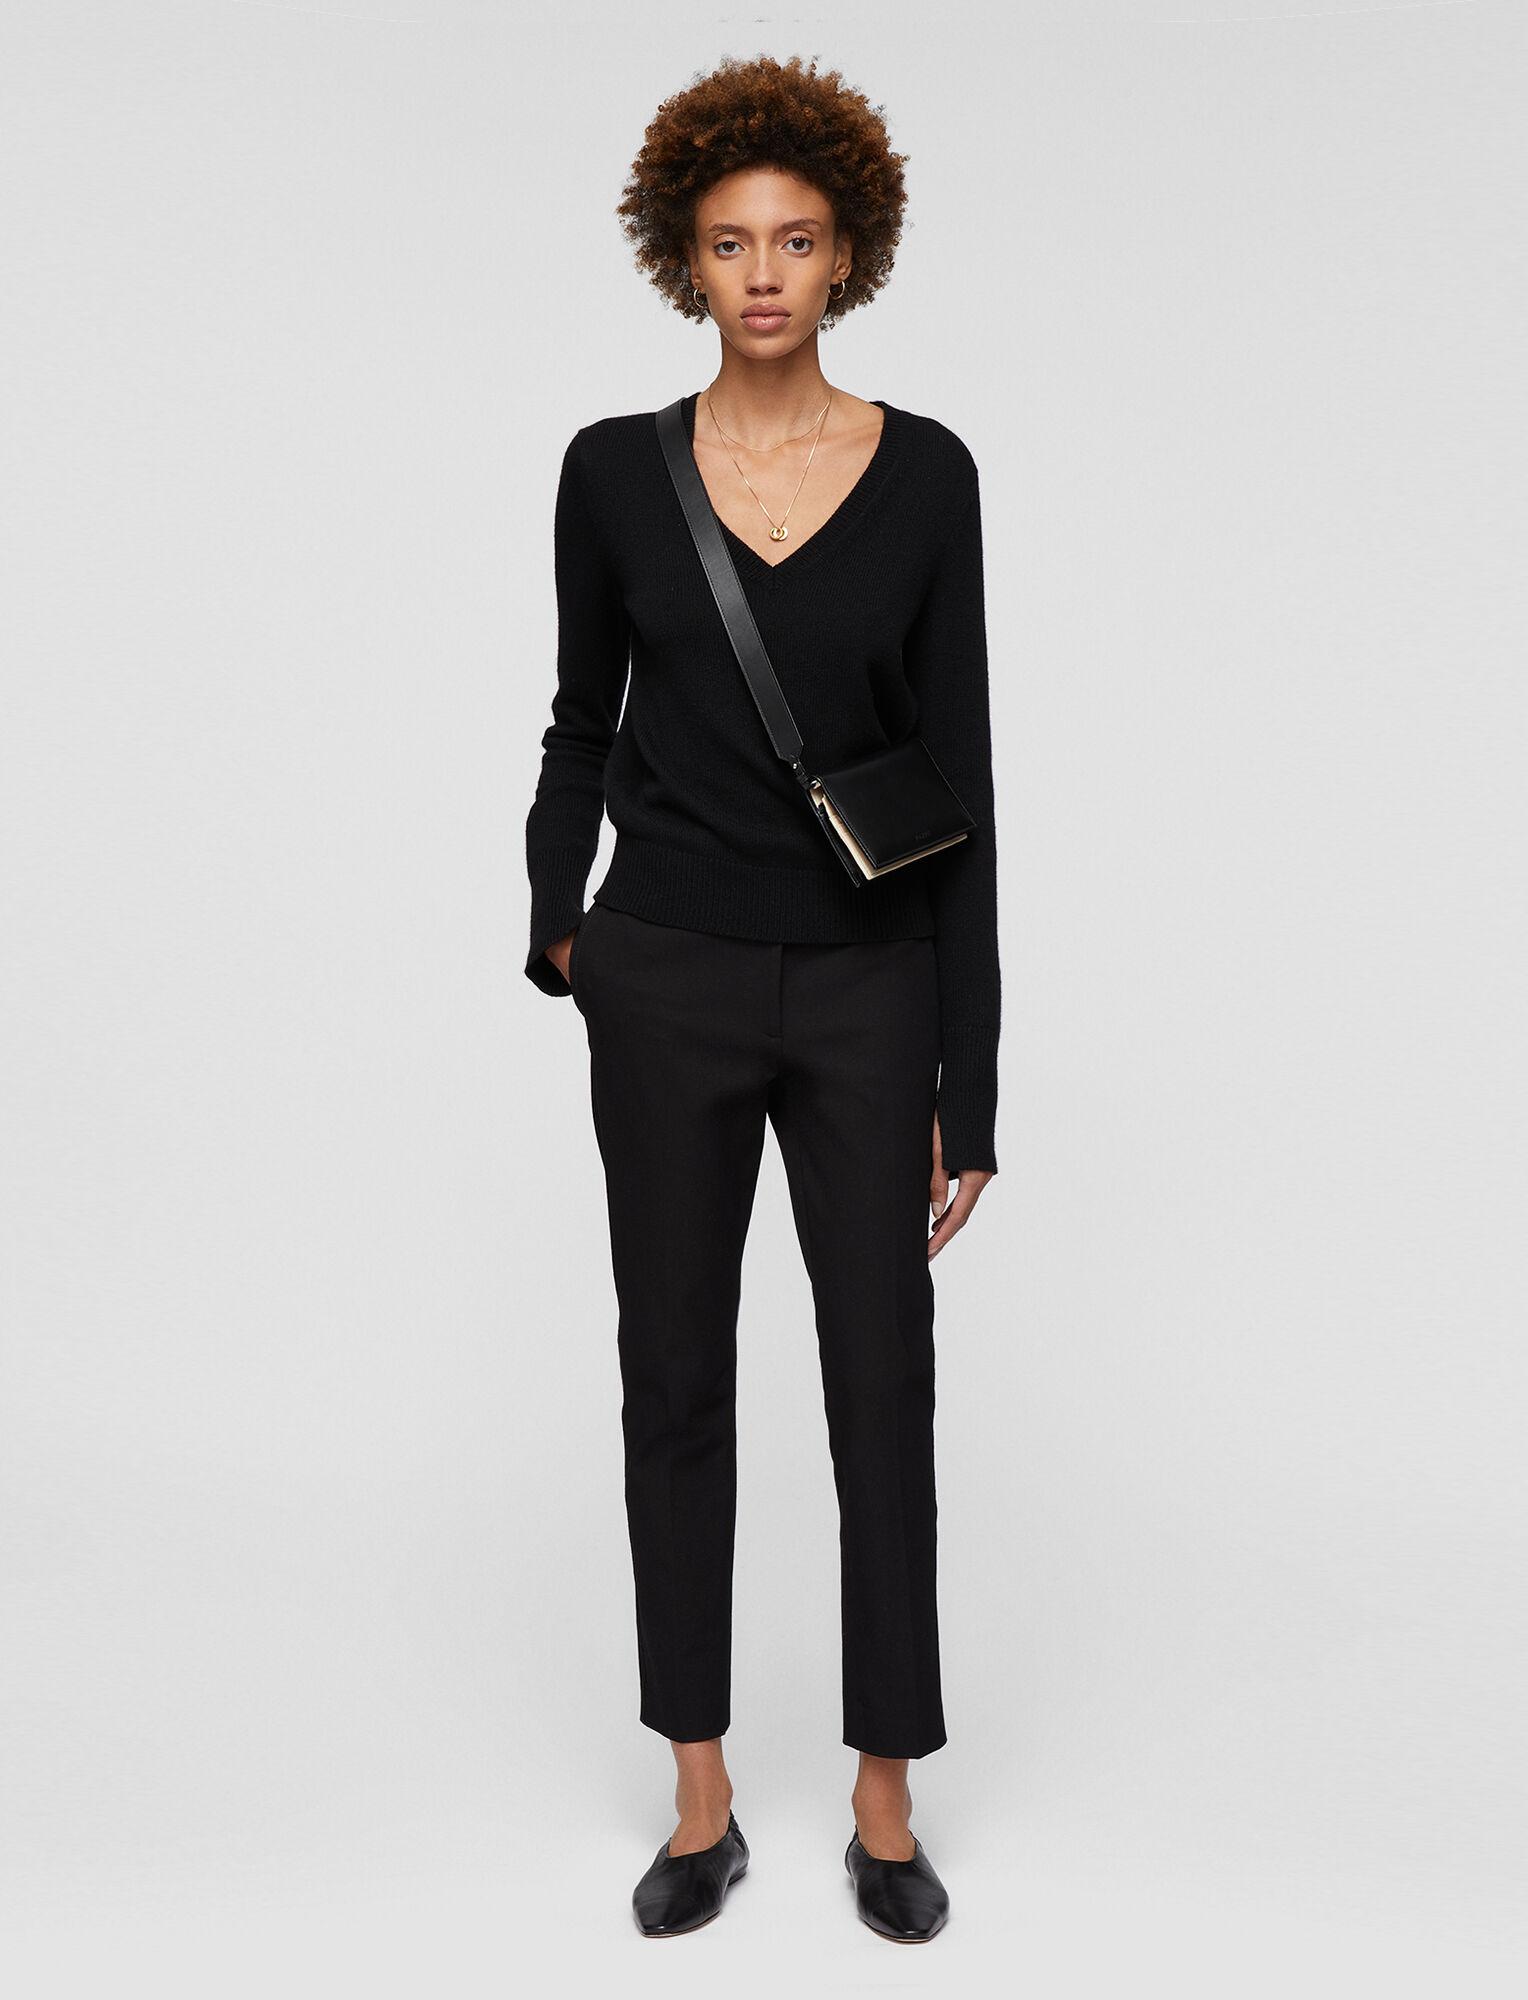 Joseph, Zoom Gabardine Stretch Trousers, in BLACK